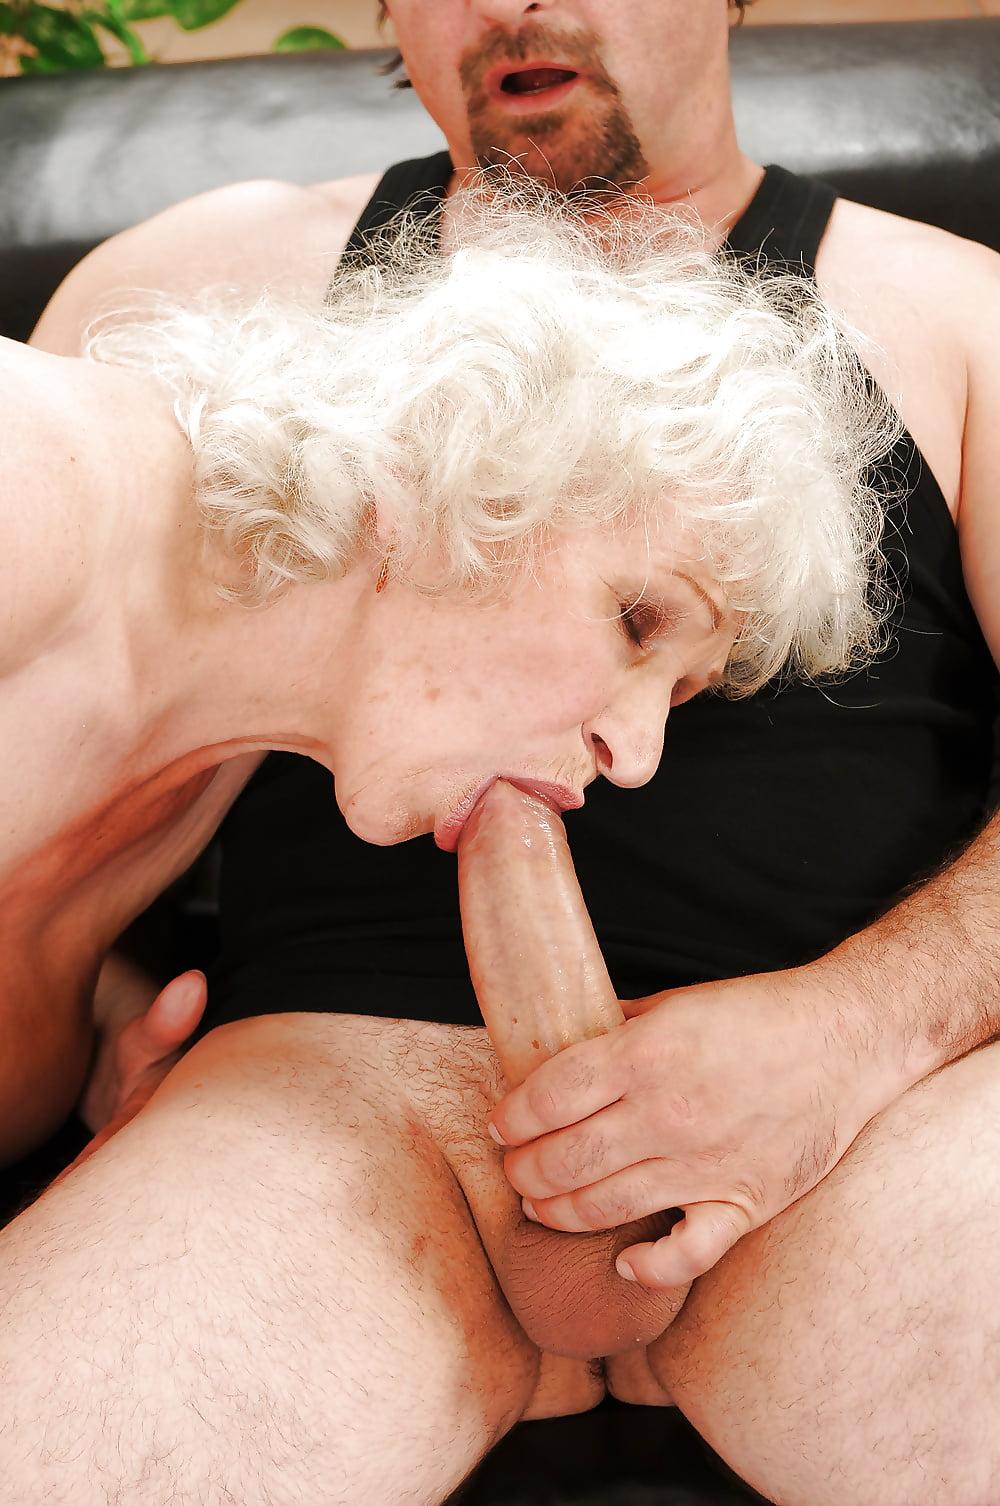 hungarian-granny-sex-orgasm-amateur-free